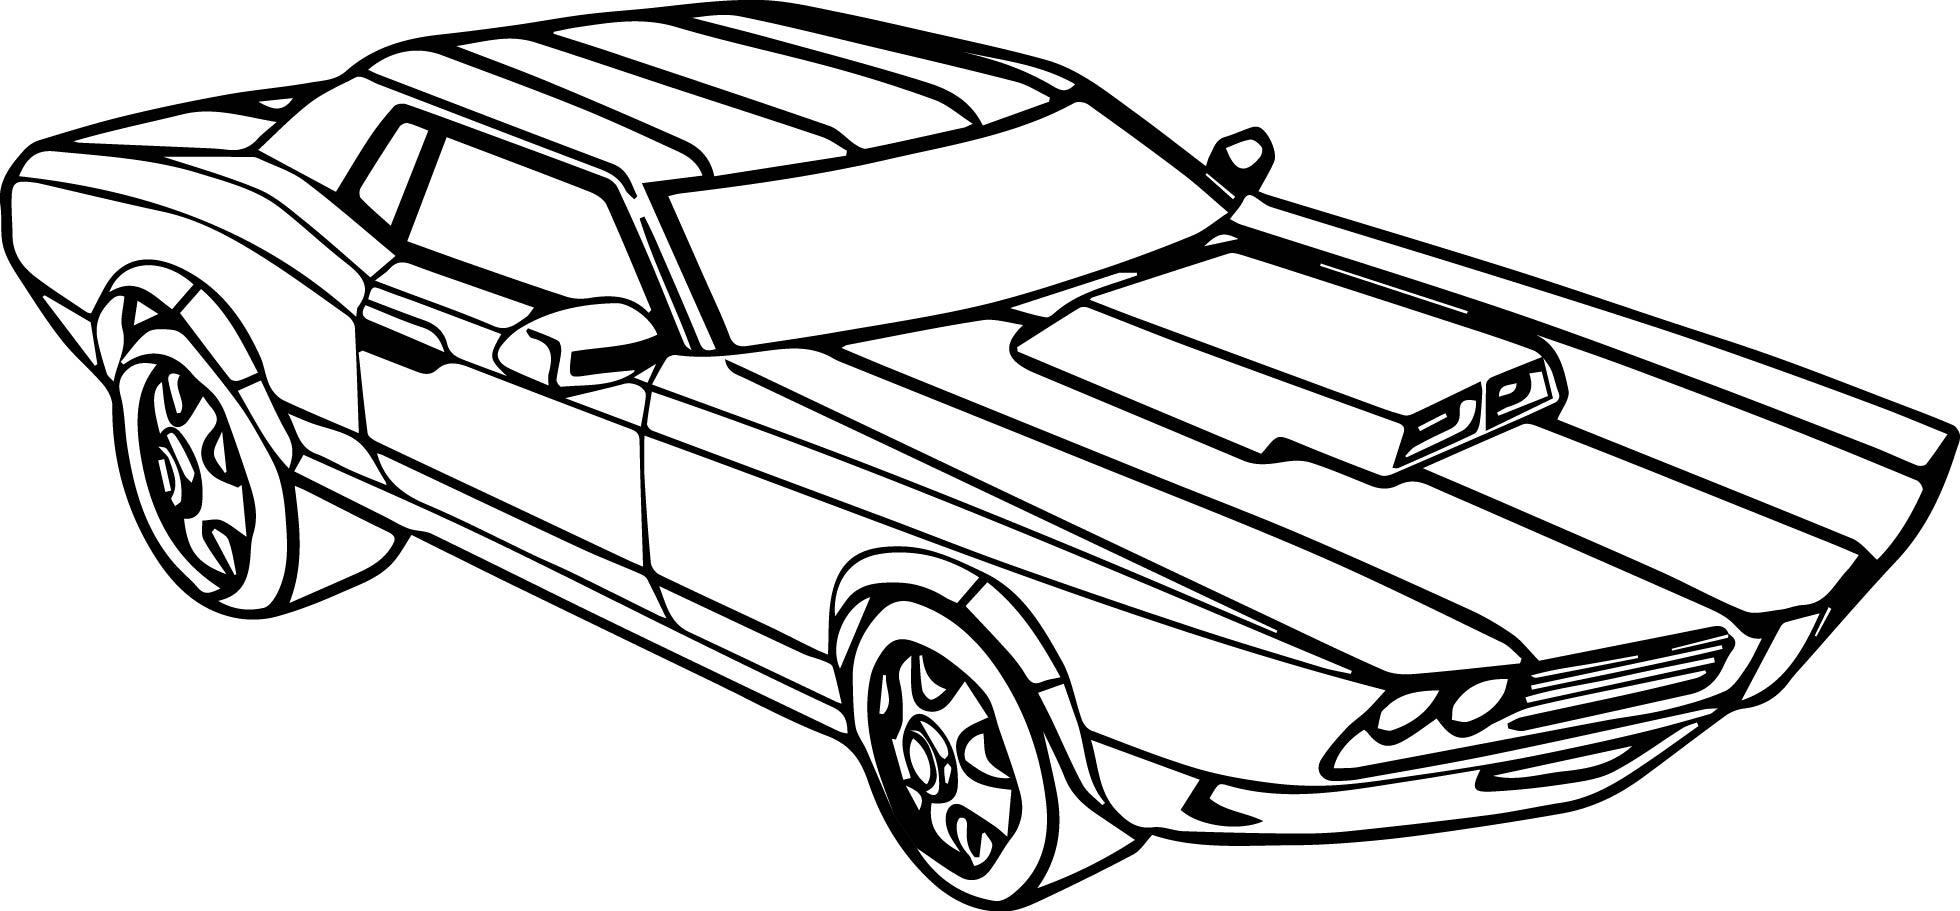 Ben Ten Kevin Car Coloring Page | Wecoloringpage